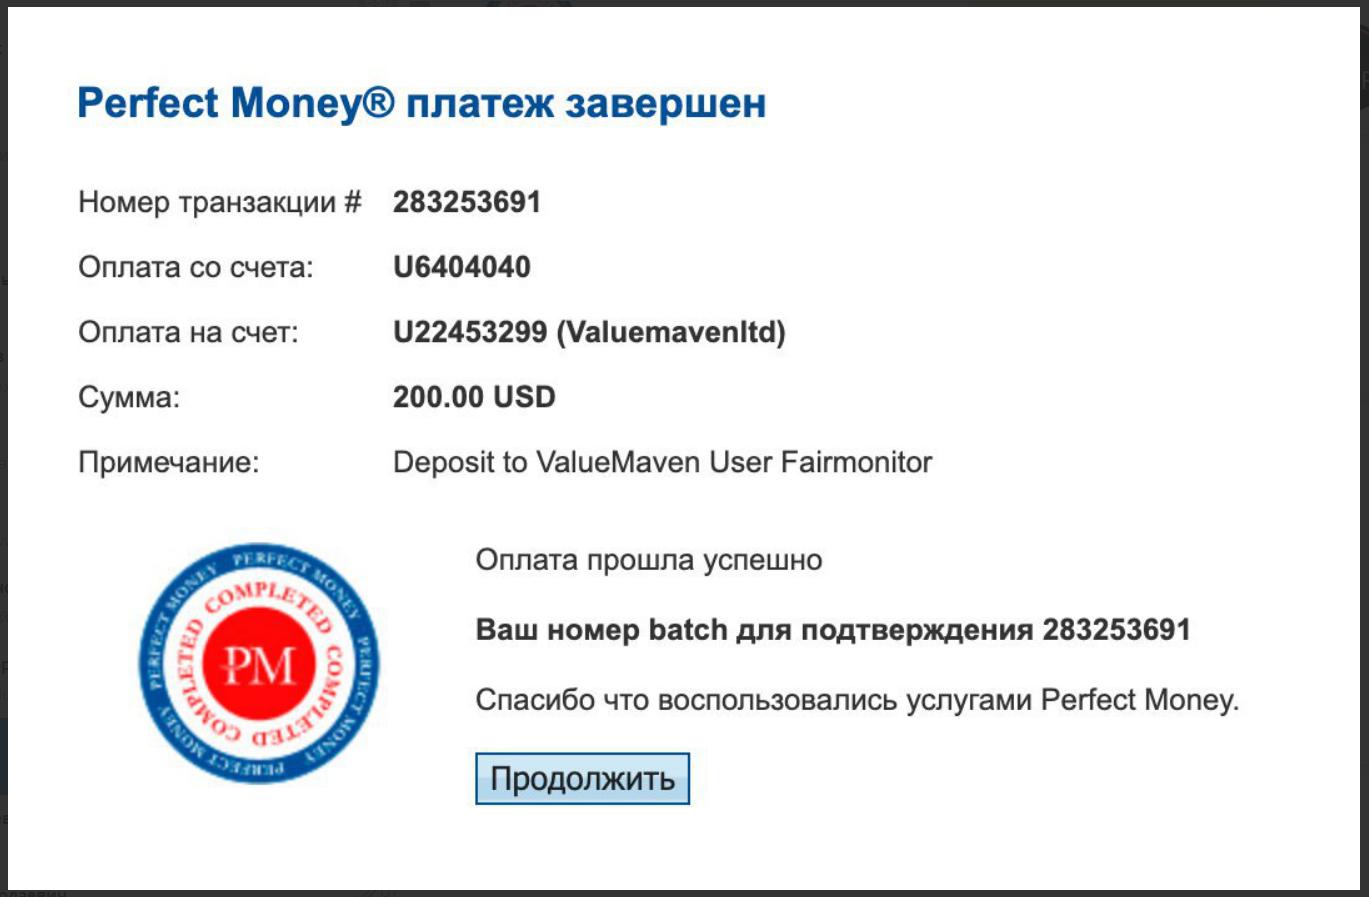 ValueMaven - valuemavenltd.com